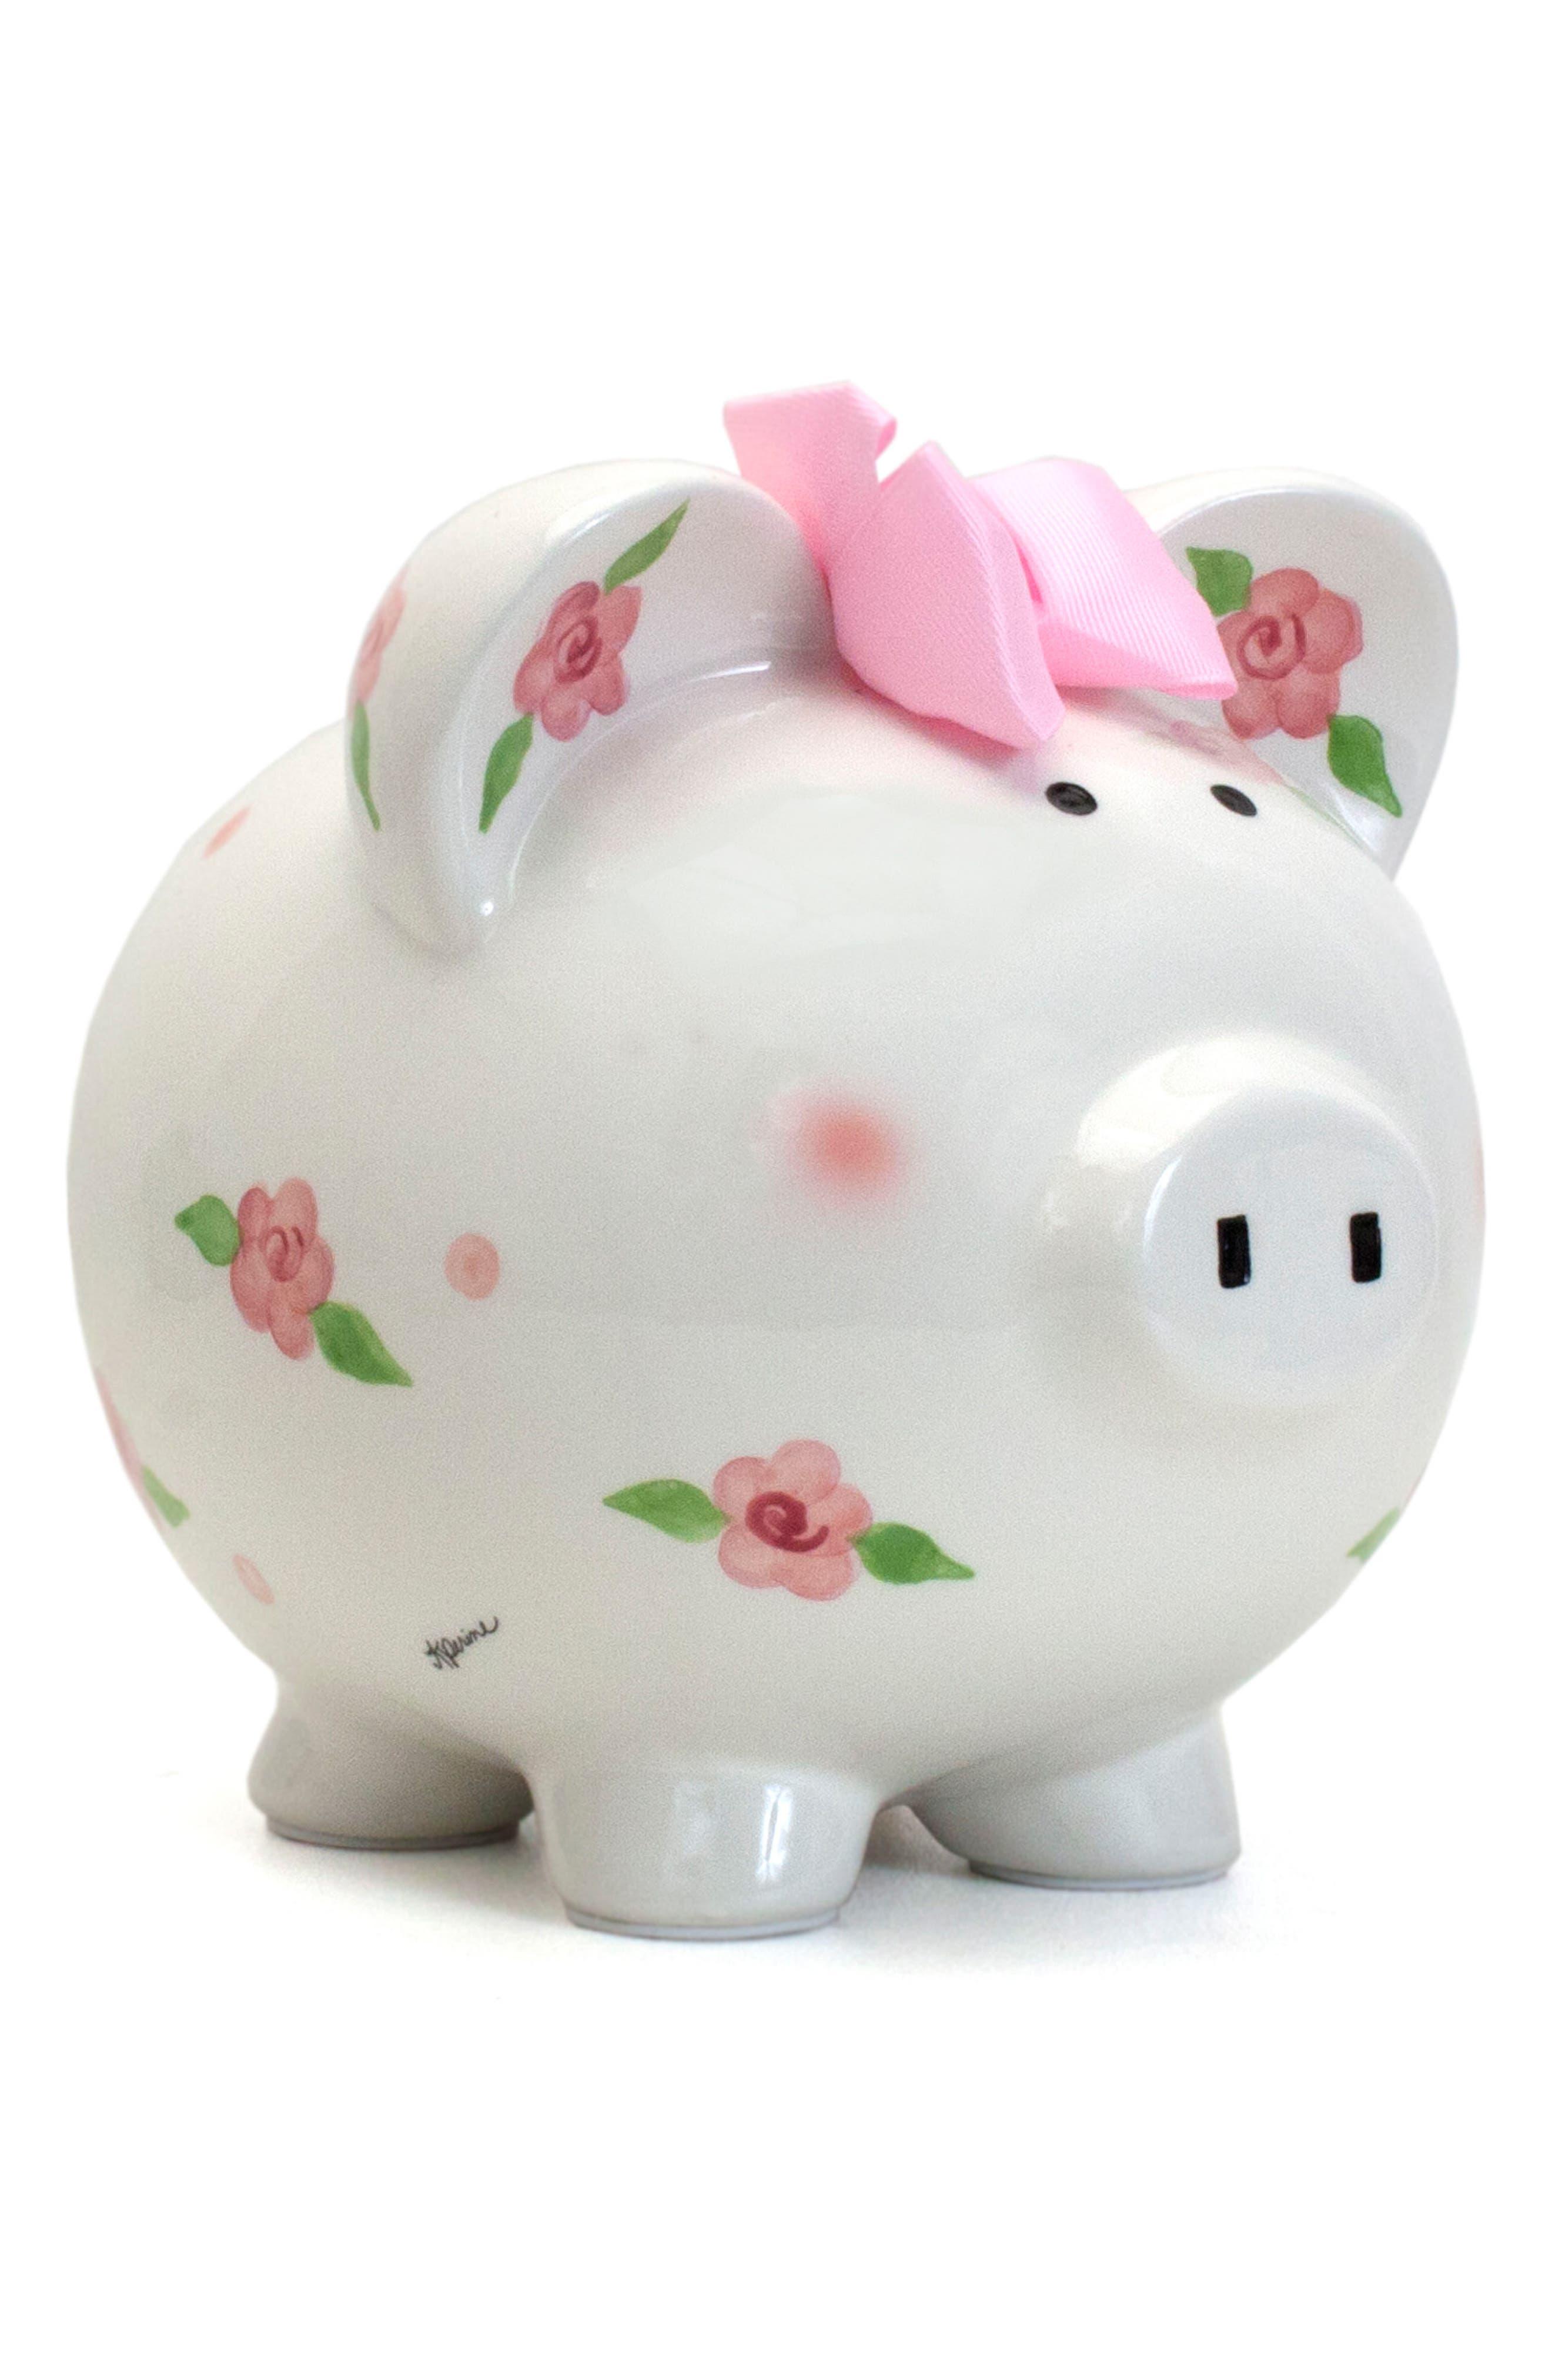 Embellished Piggy Bank,                         Main,                         color, WHITE